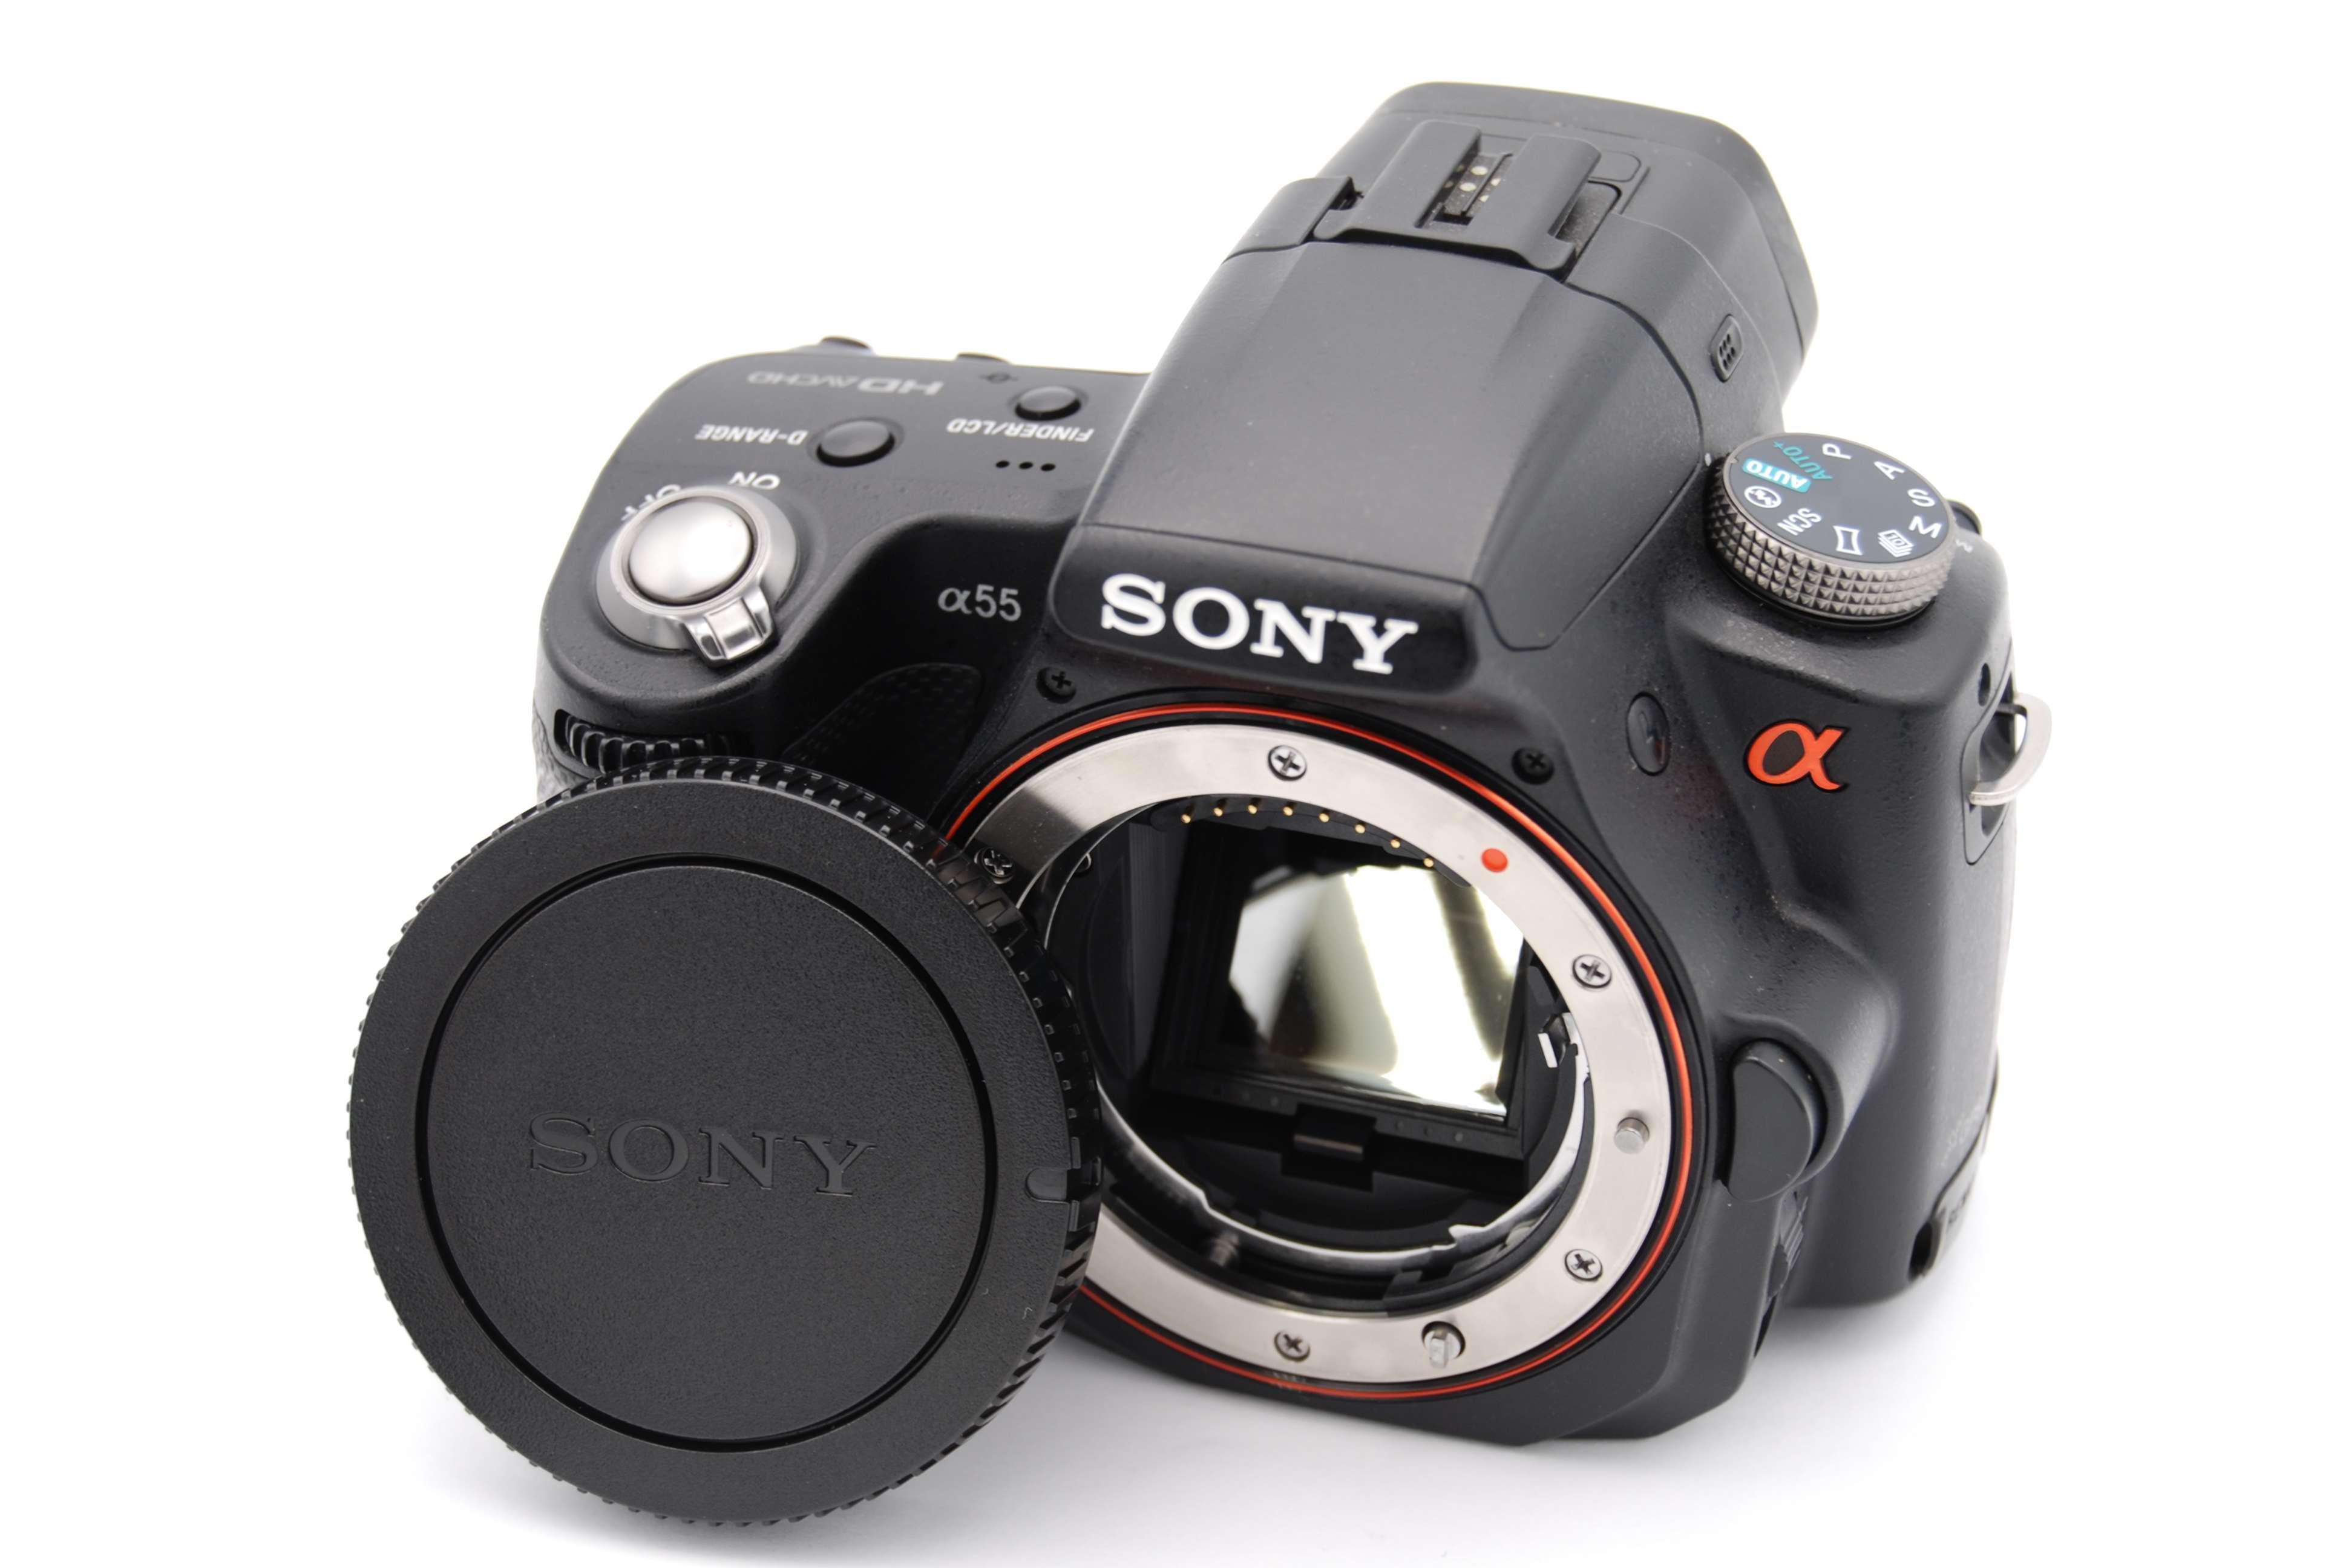 sony alpha slt a55 16 2mp digital slr camera black body only rh ebay com sony alpha a55 manual pdf sony slt a55 manual pdf